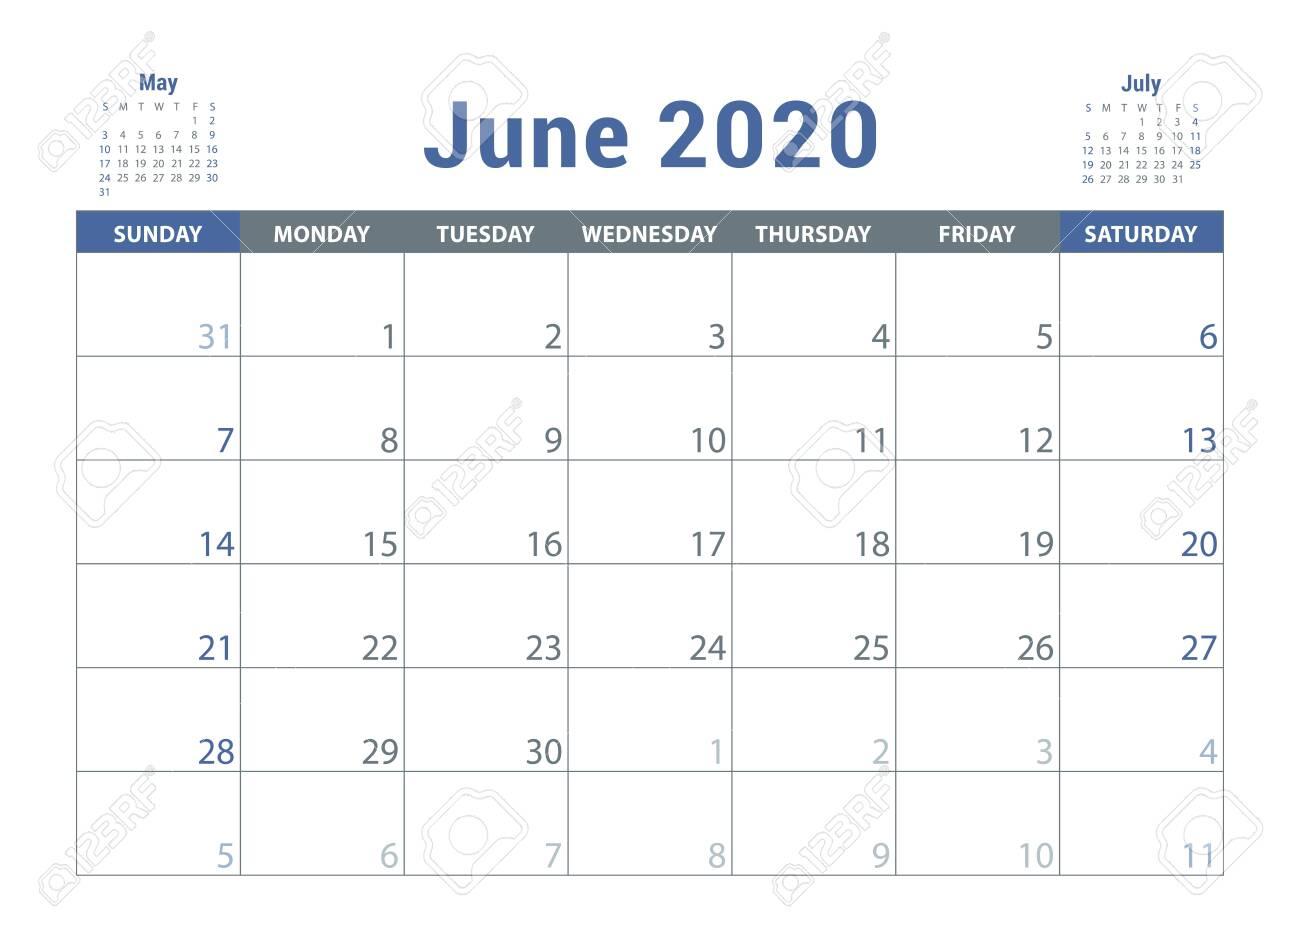 June 2020 Calendar. English Planner. Ð¡olor Vector Template. Week Starts On  Sunday. Business Planning. New Year Calender. Clean Minimal Table. Simple  Design Lizenzfrei Nutzbare Vektorgrafiken, Clip Arts, Illustrationen. Image  129897510.